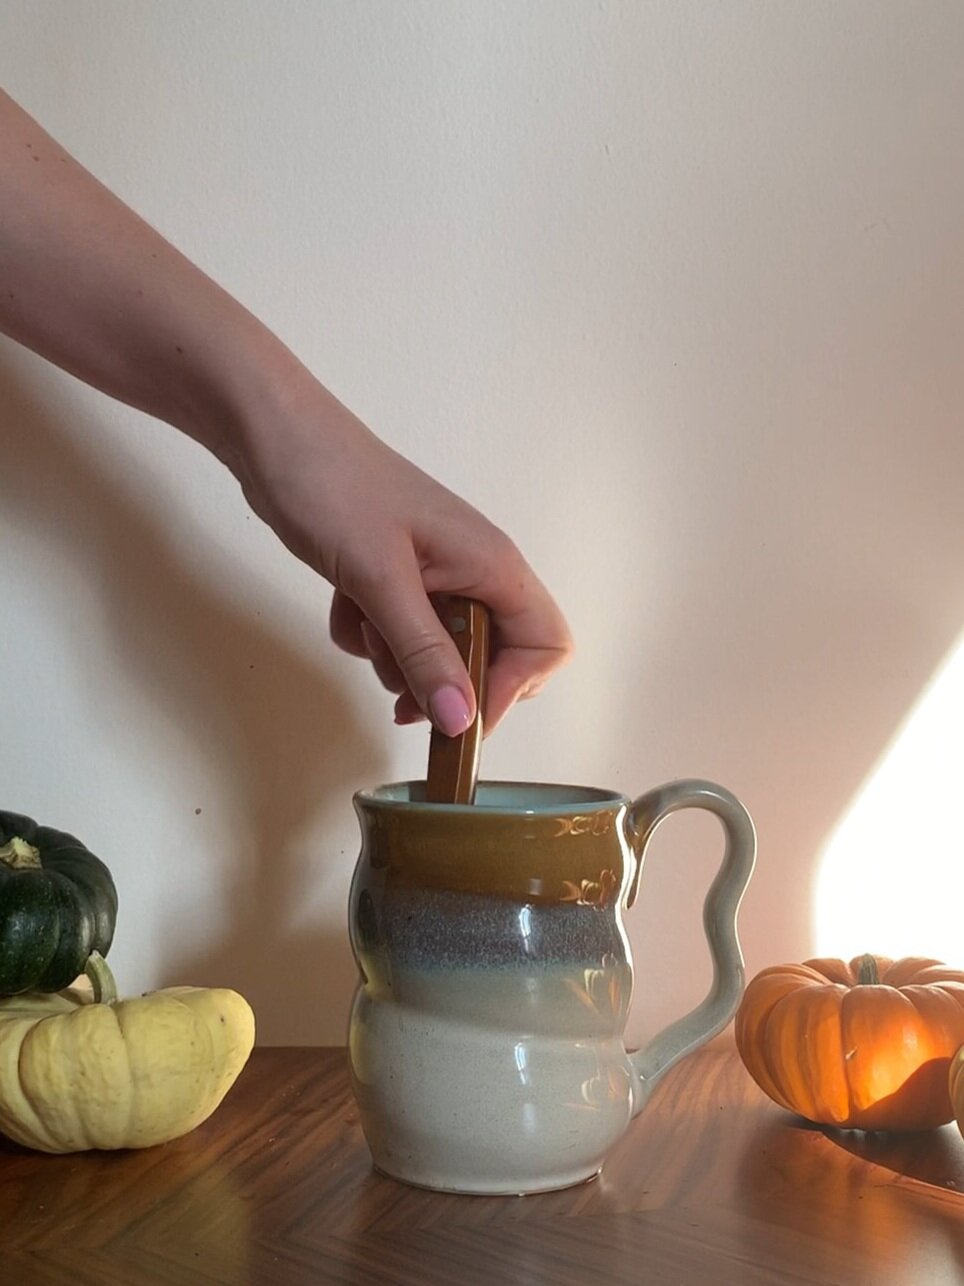 stir+together+coffee+and+milk.jpg